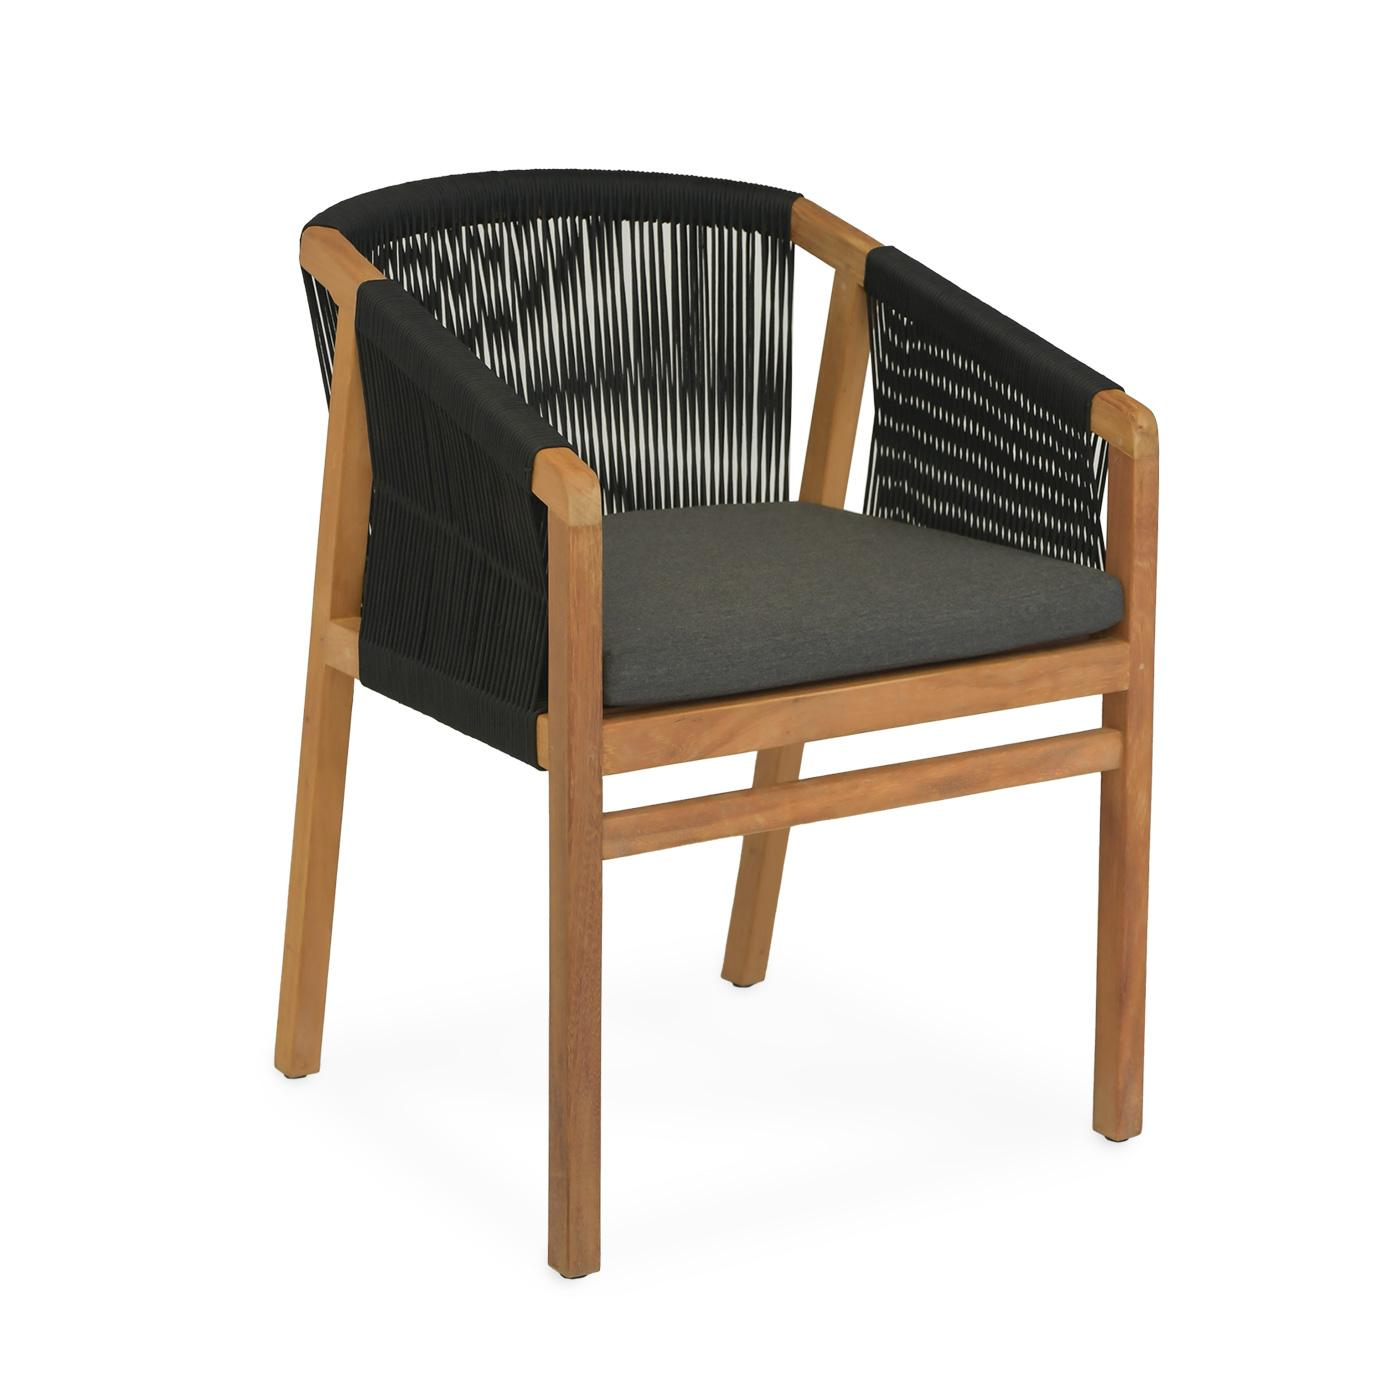 savanna-din-chair-black